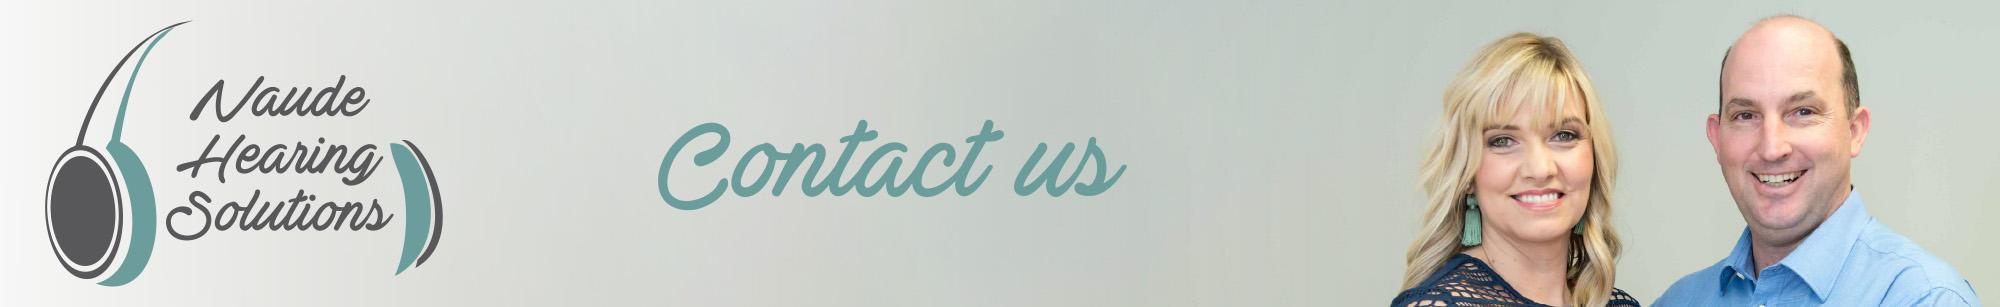 Naude Hearing Solutions - Contact Us